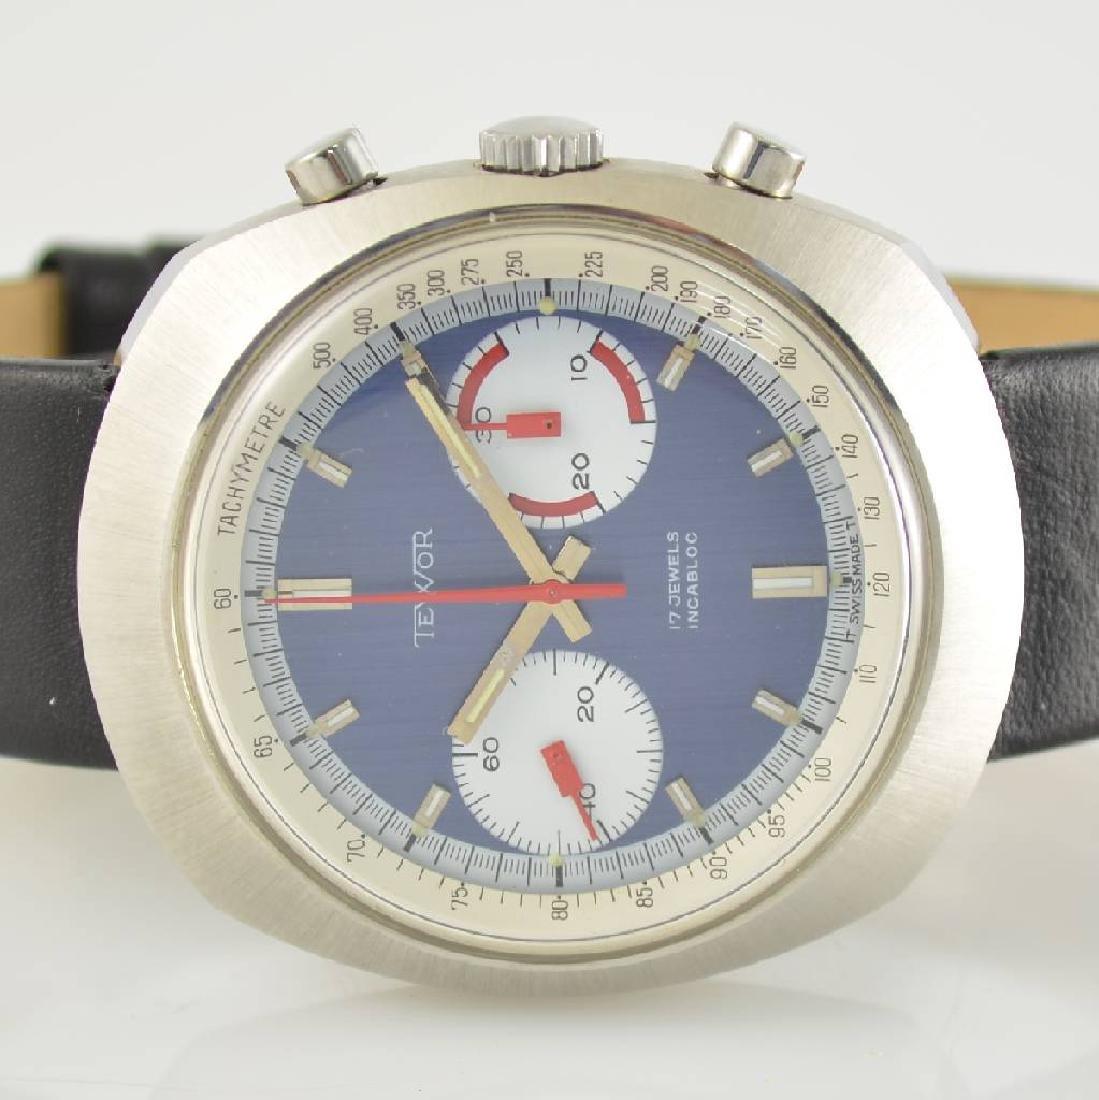 TEWOR unworn gents wristwatch with chronograph - 2